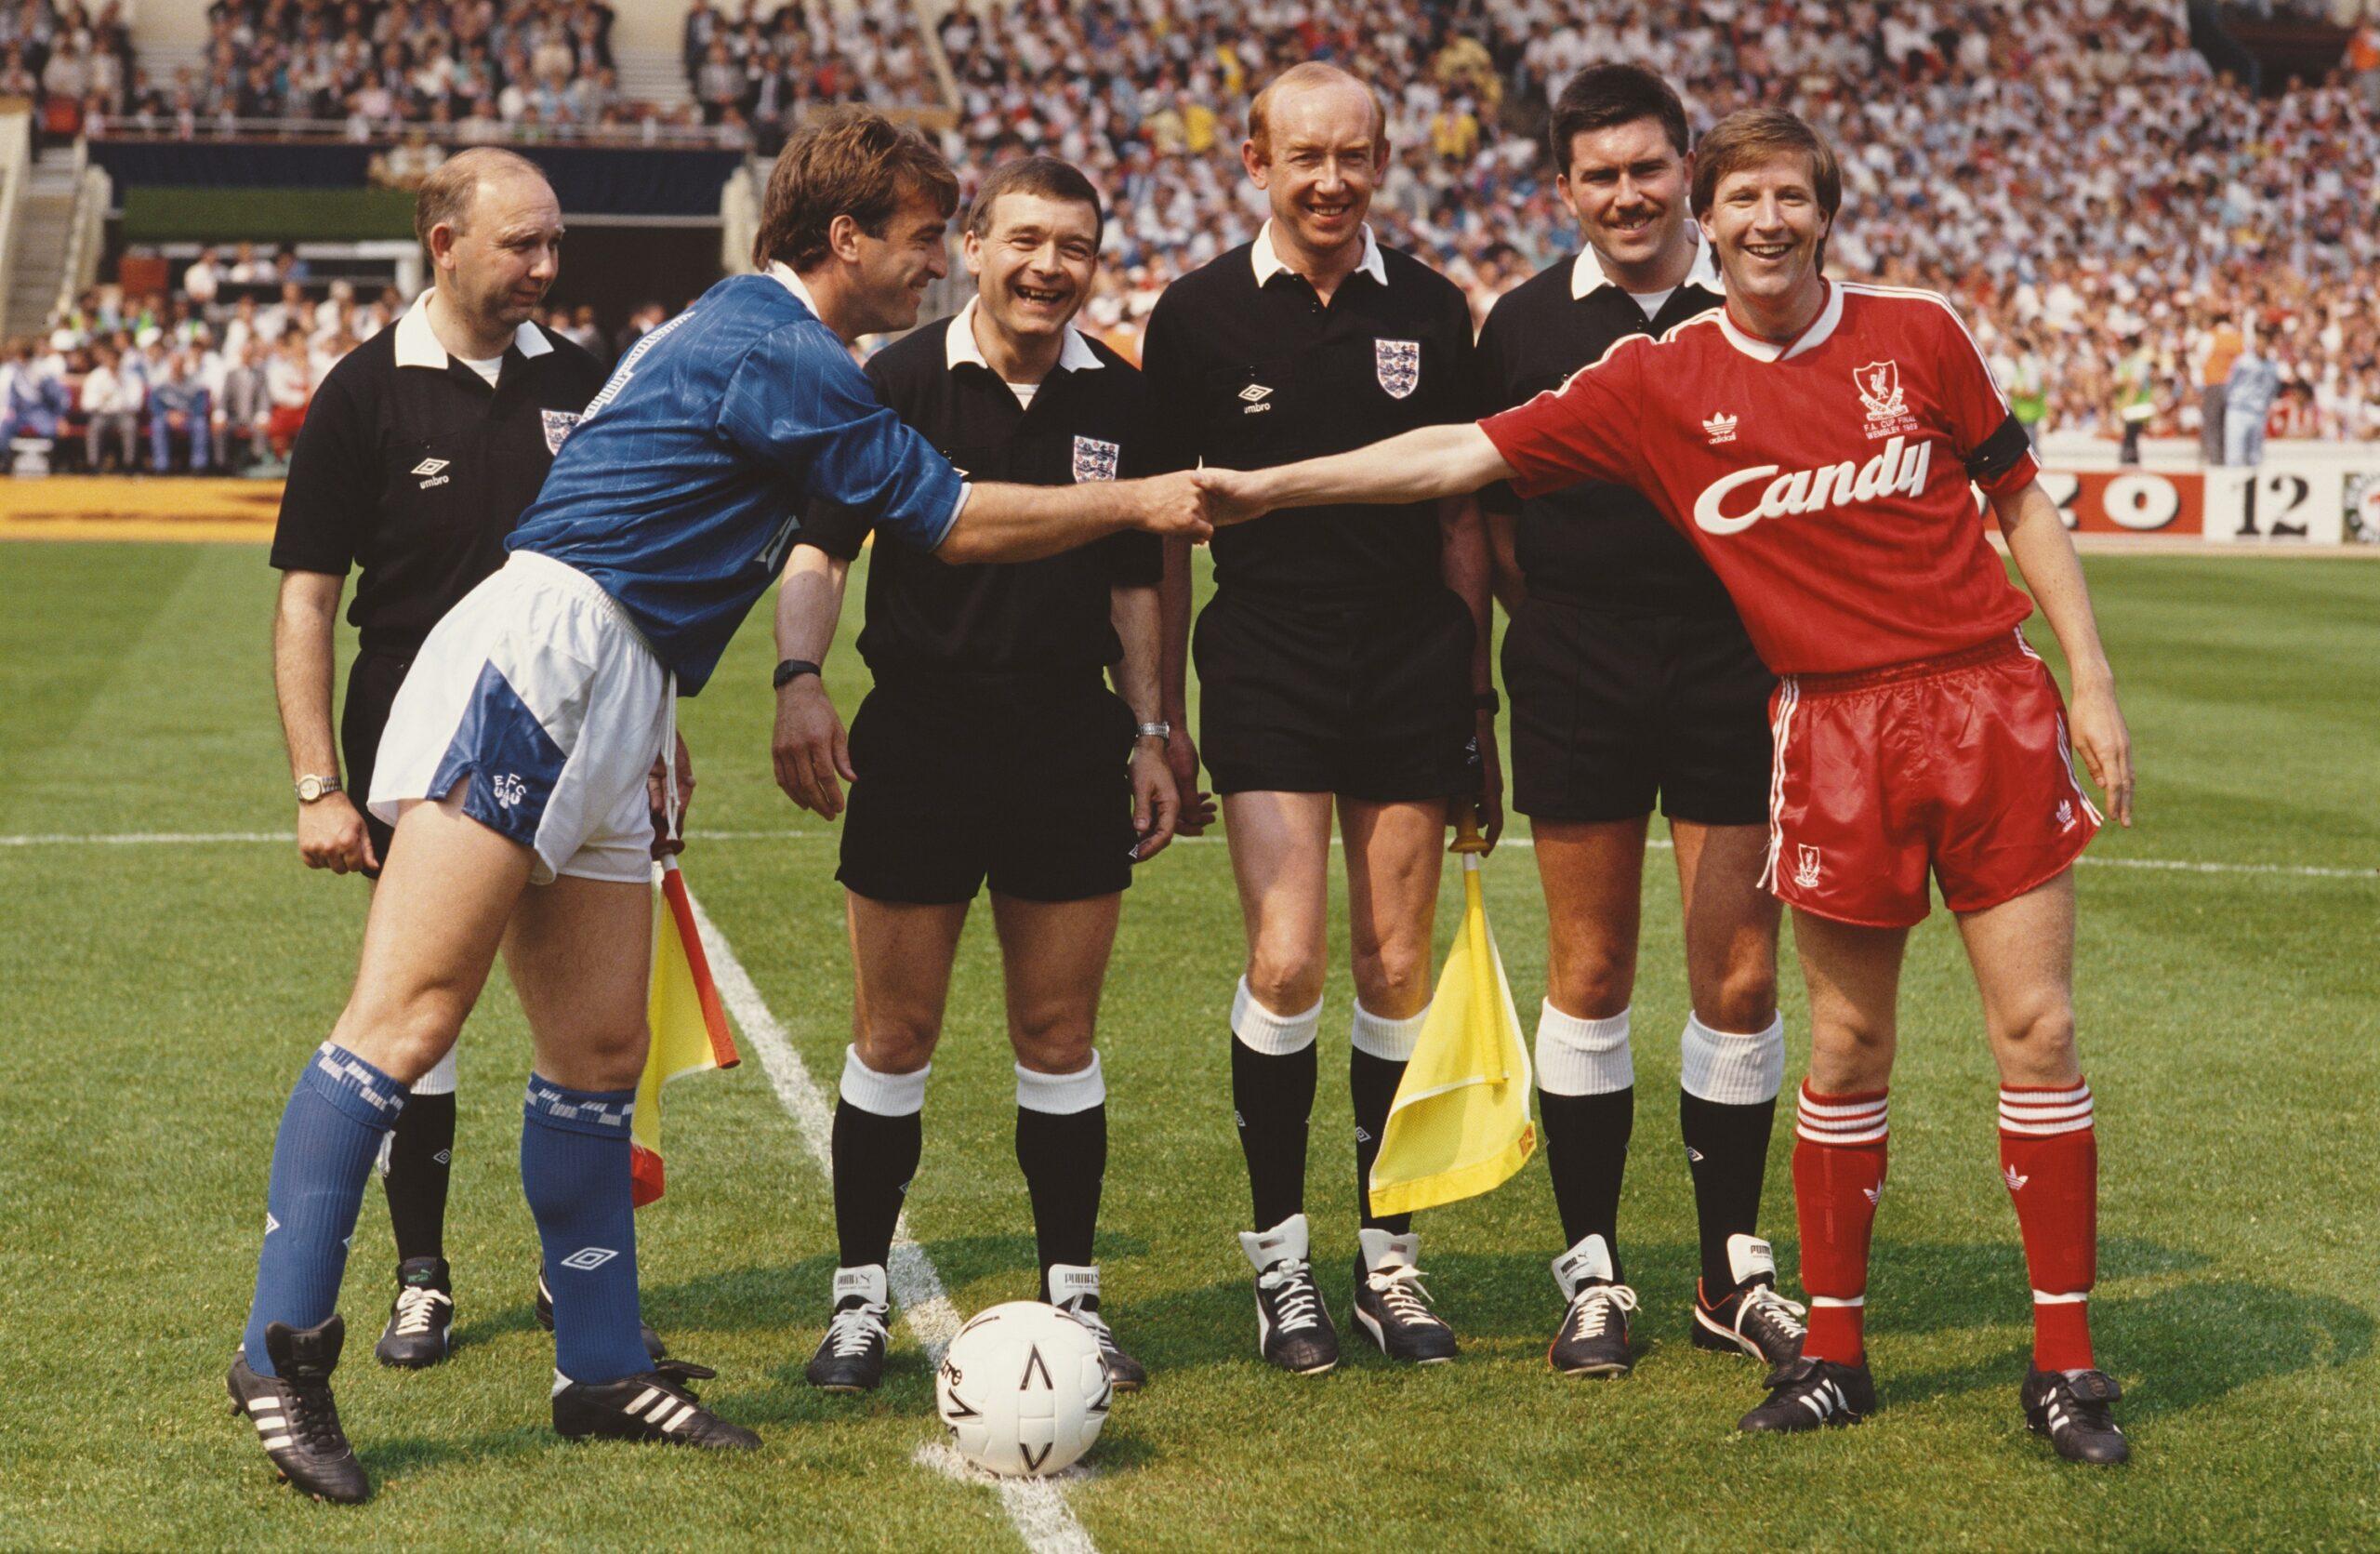 ronnie_whelan_kevin_ratcliffe_final_fa_cup_1989_simon_bruty_allsport